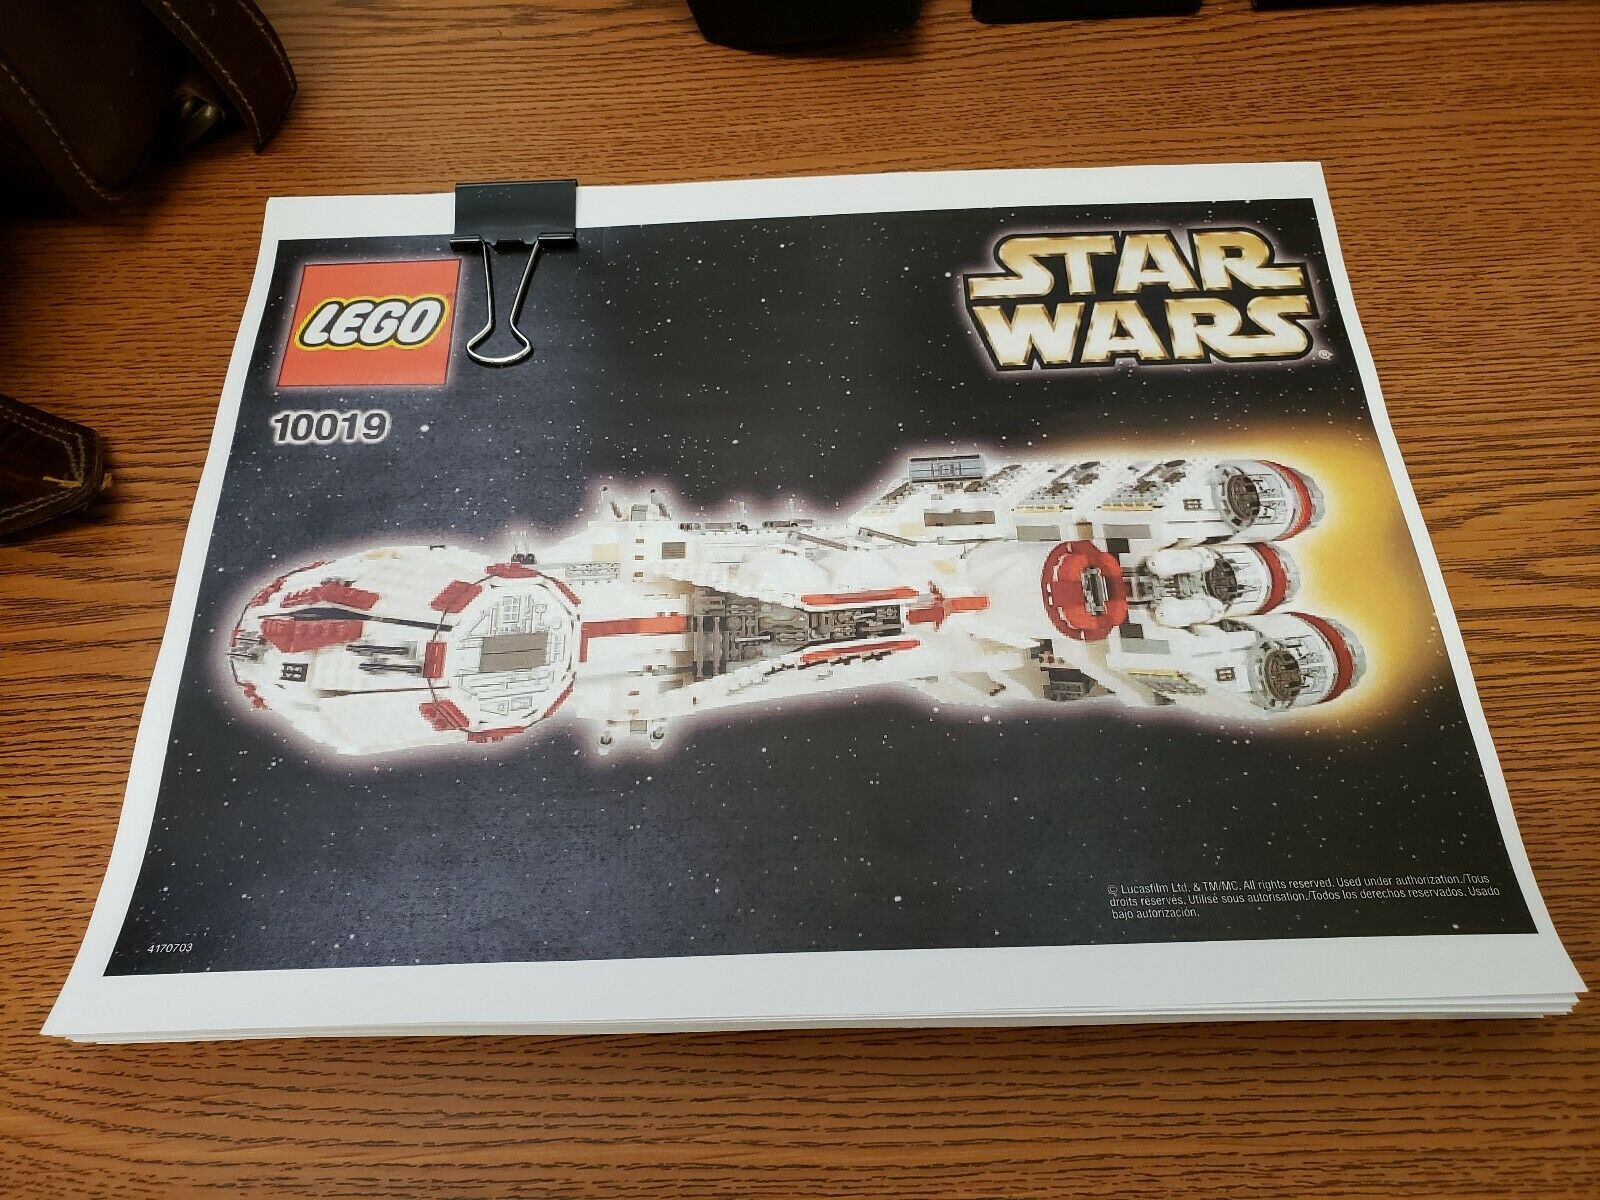 Lego 10019 Rebel corrojoor bloqueo tantiv IV Personalizado instrucciones de reemplazo